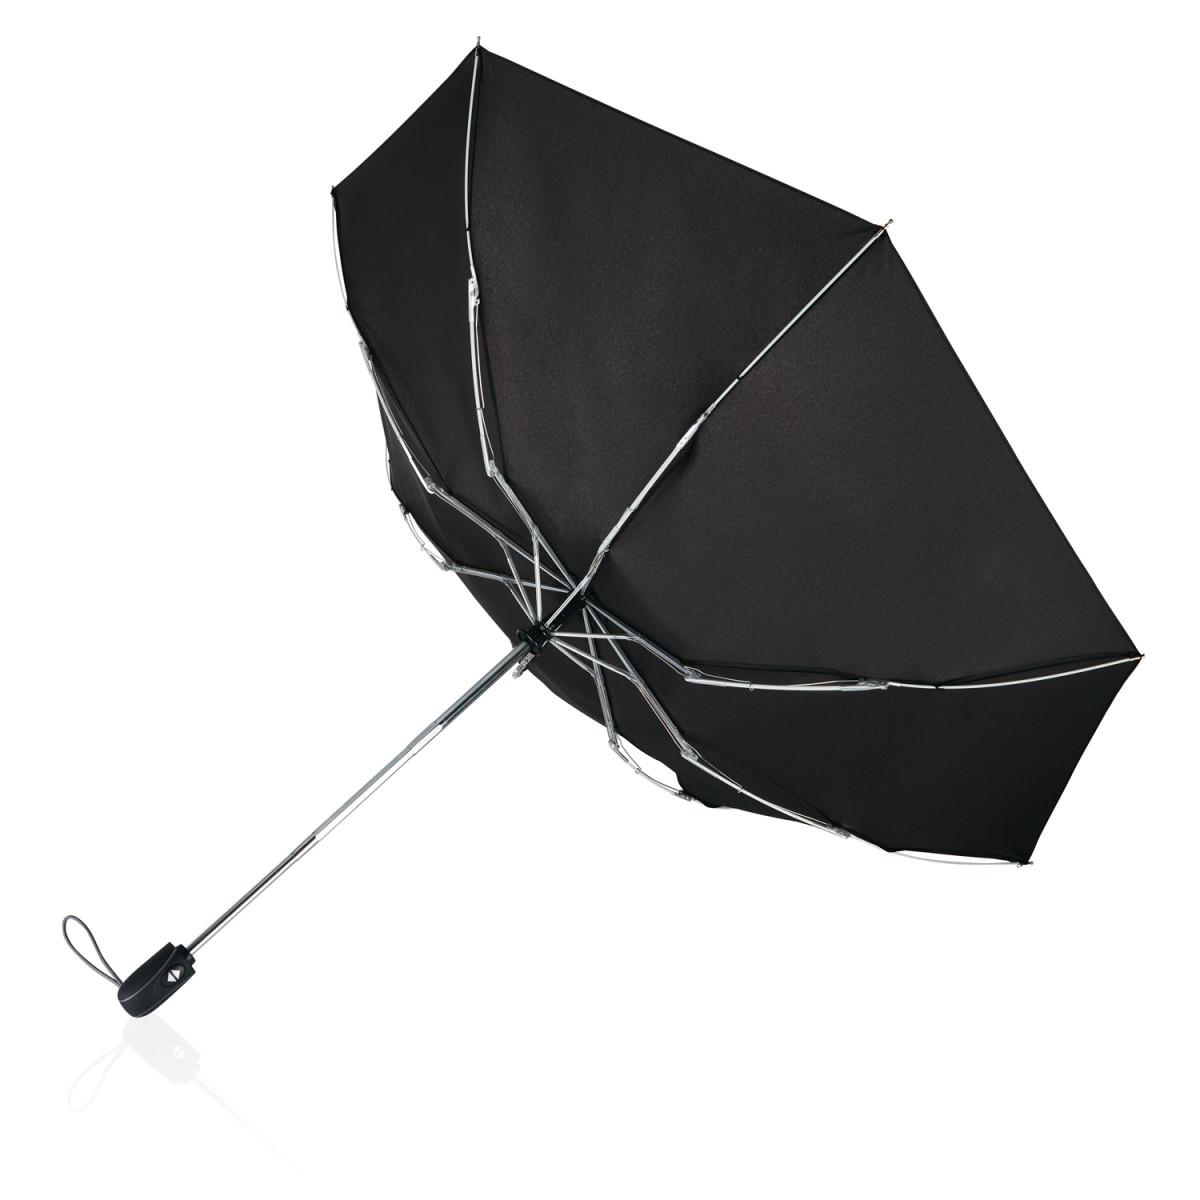 Складной зонт-автомат Traveler Swiss Peak 21